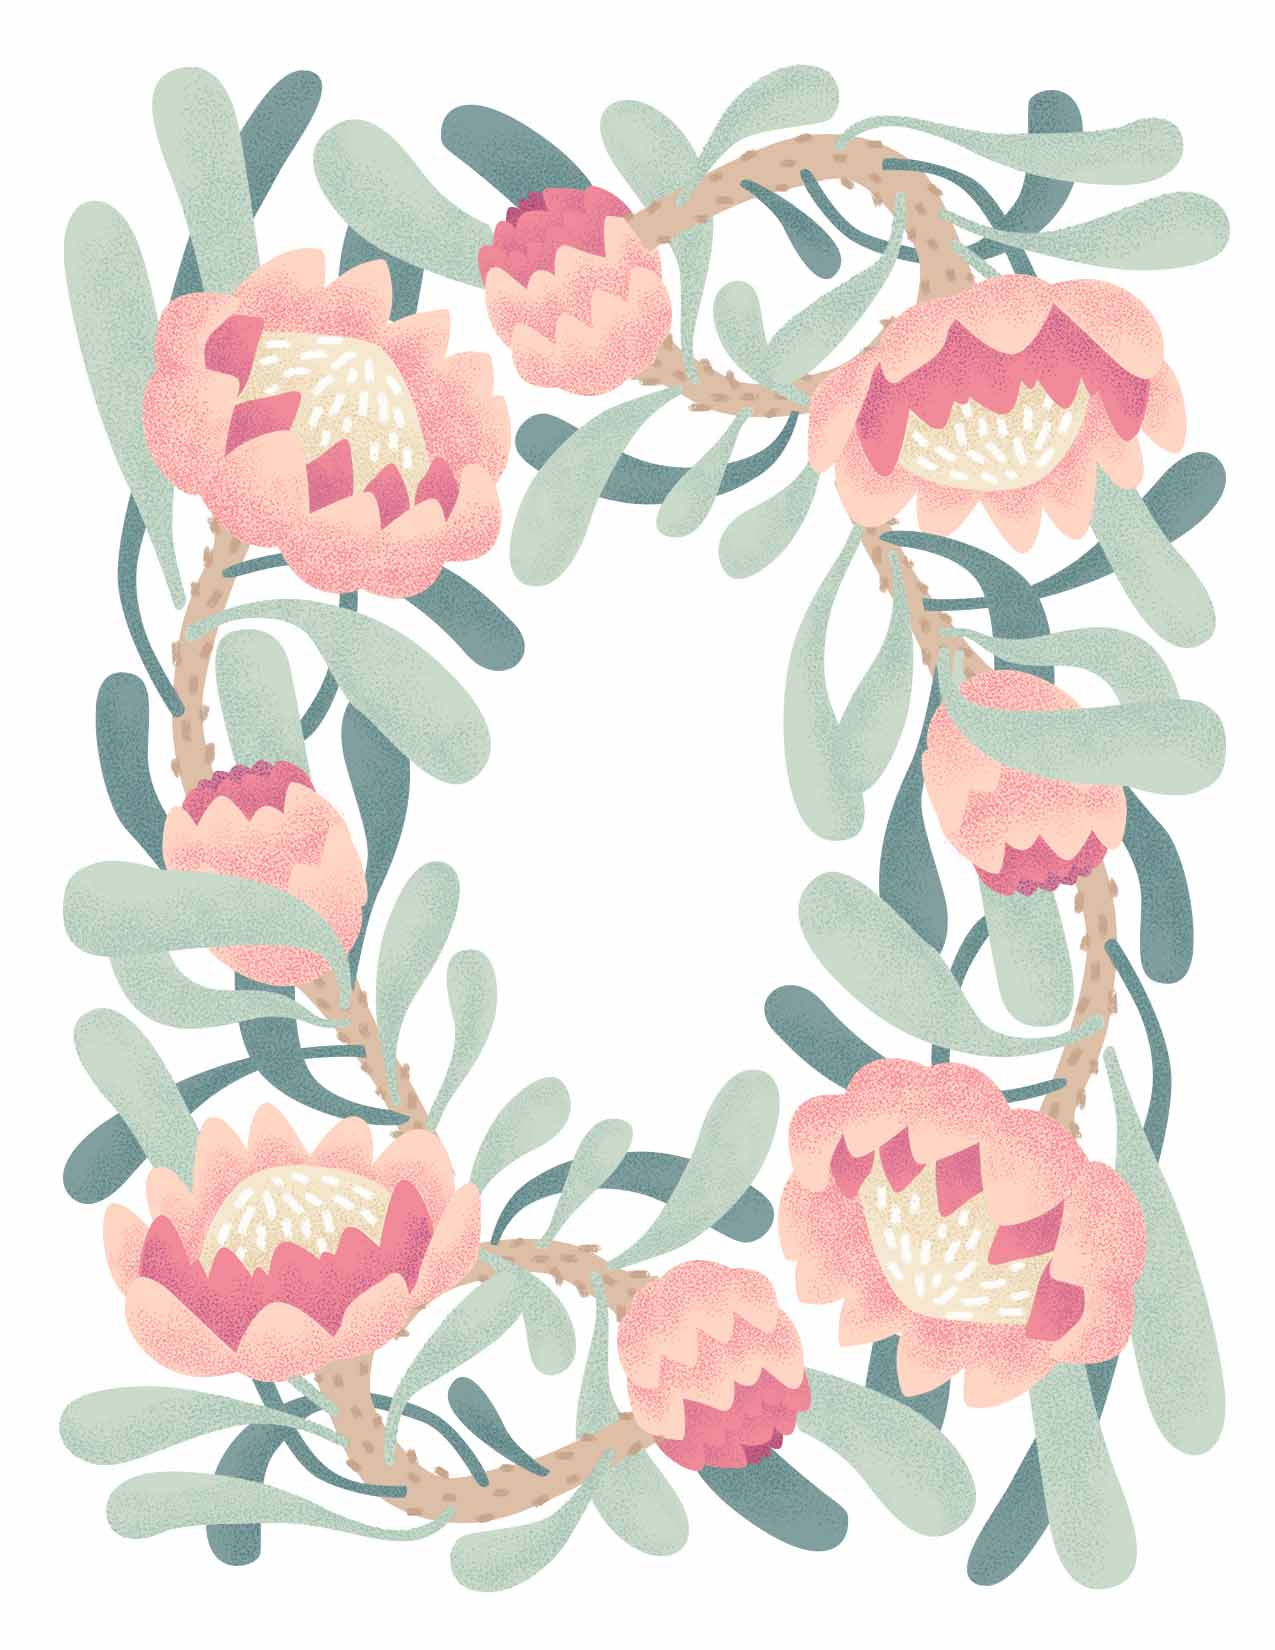 Pink Protea Illustration by Jessie Tyree Jenness